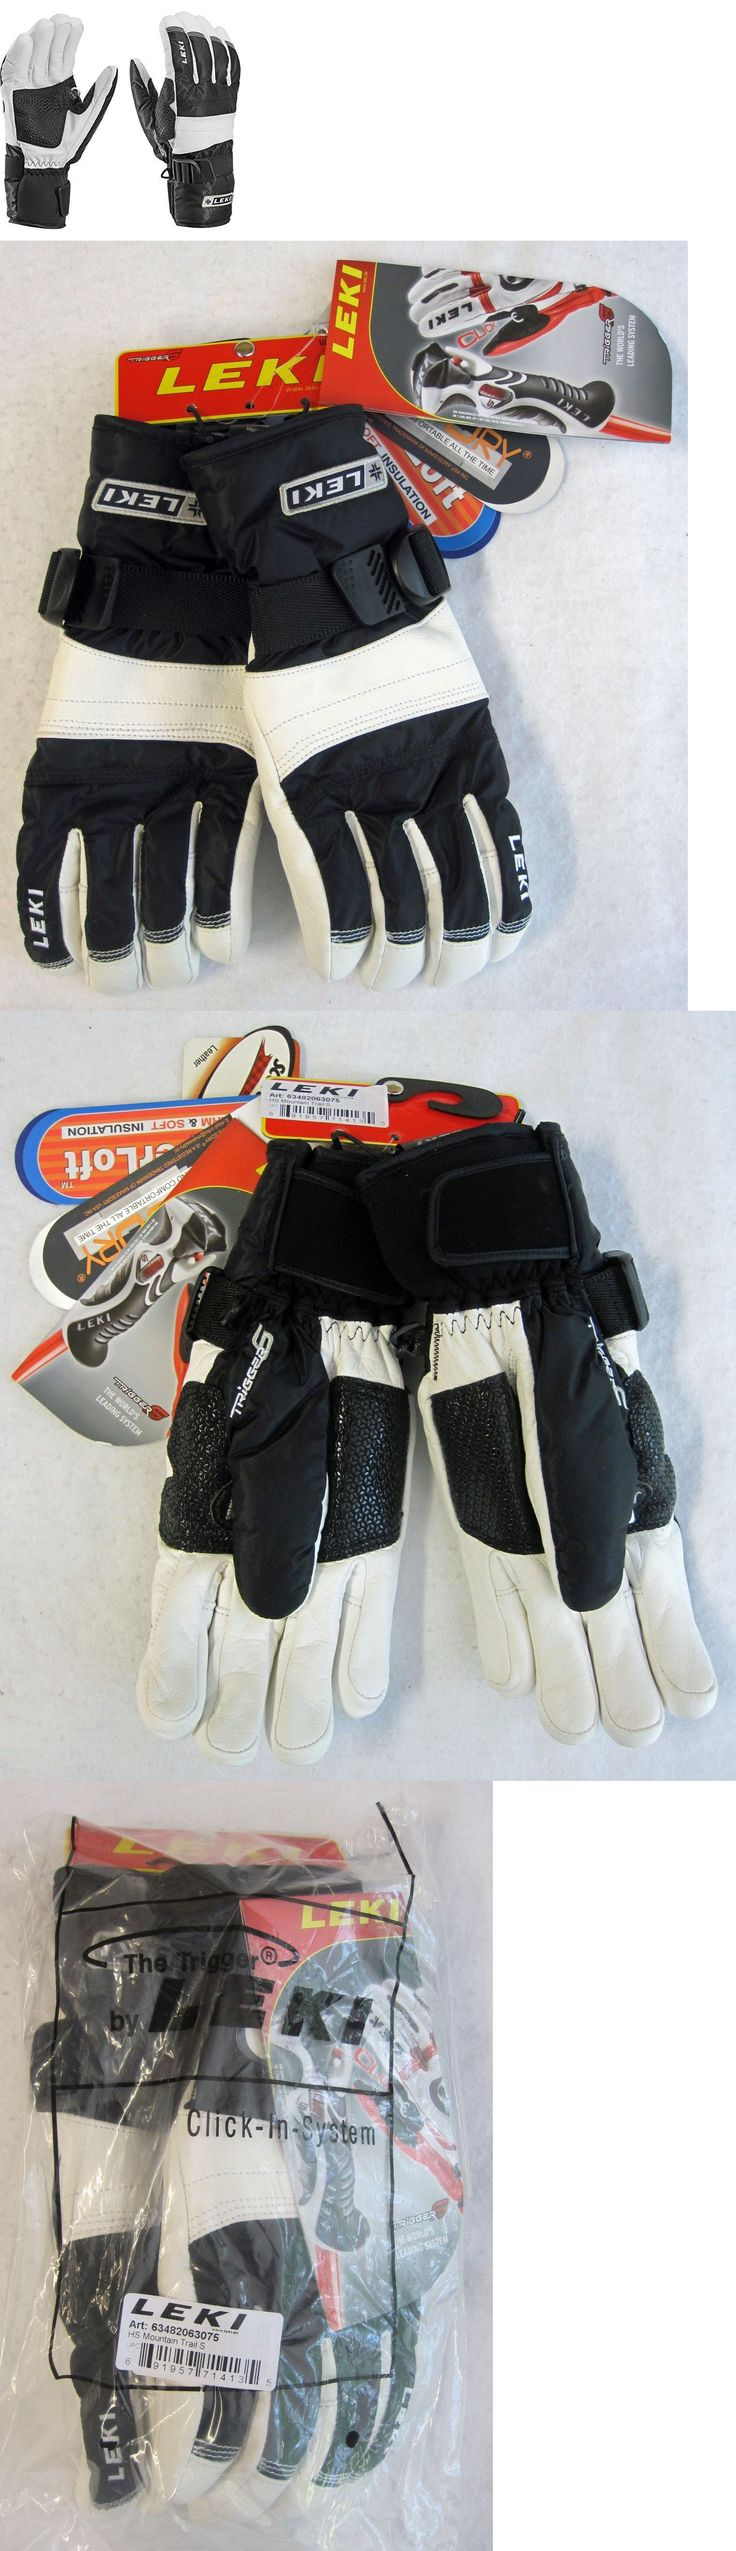 Gloves and Mittens 62172: New Leki Mountain Trail S Ski Gloves - Unisex Sizes 6.5, 7.0, 7.5, 8.0, 8.5 -> BUY IT NOW ONLY: $69.0 on eBay!